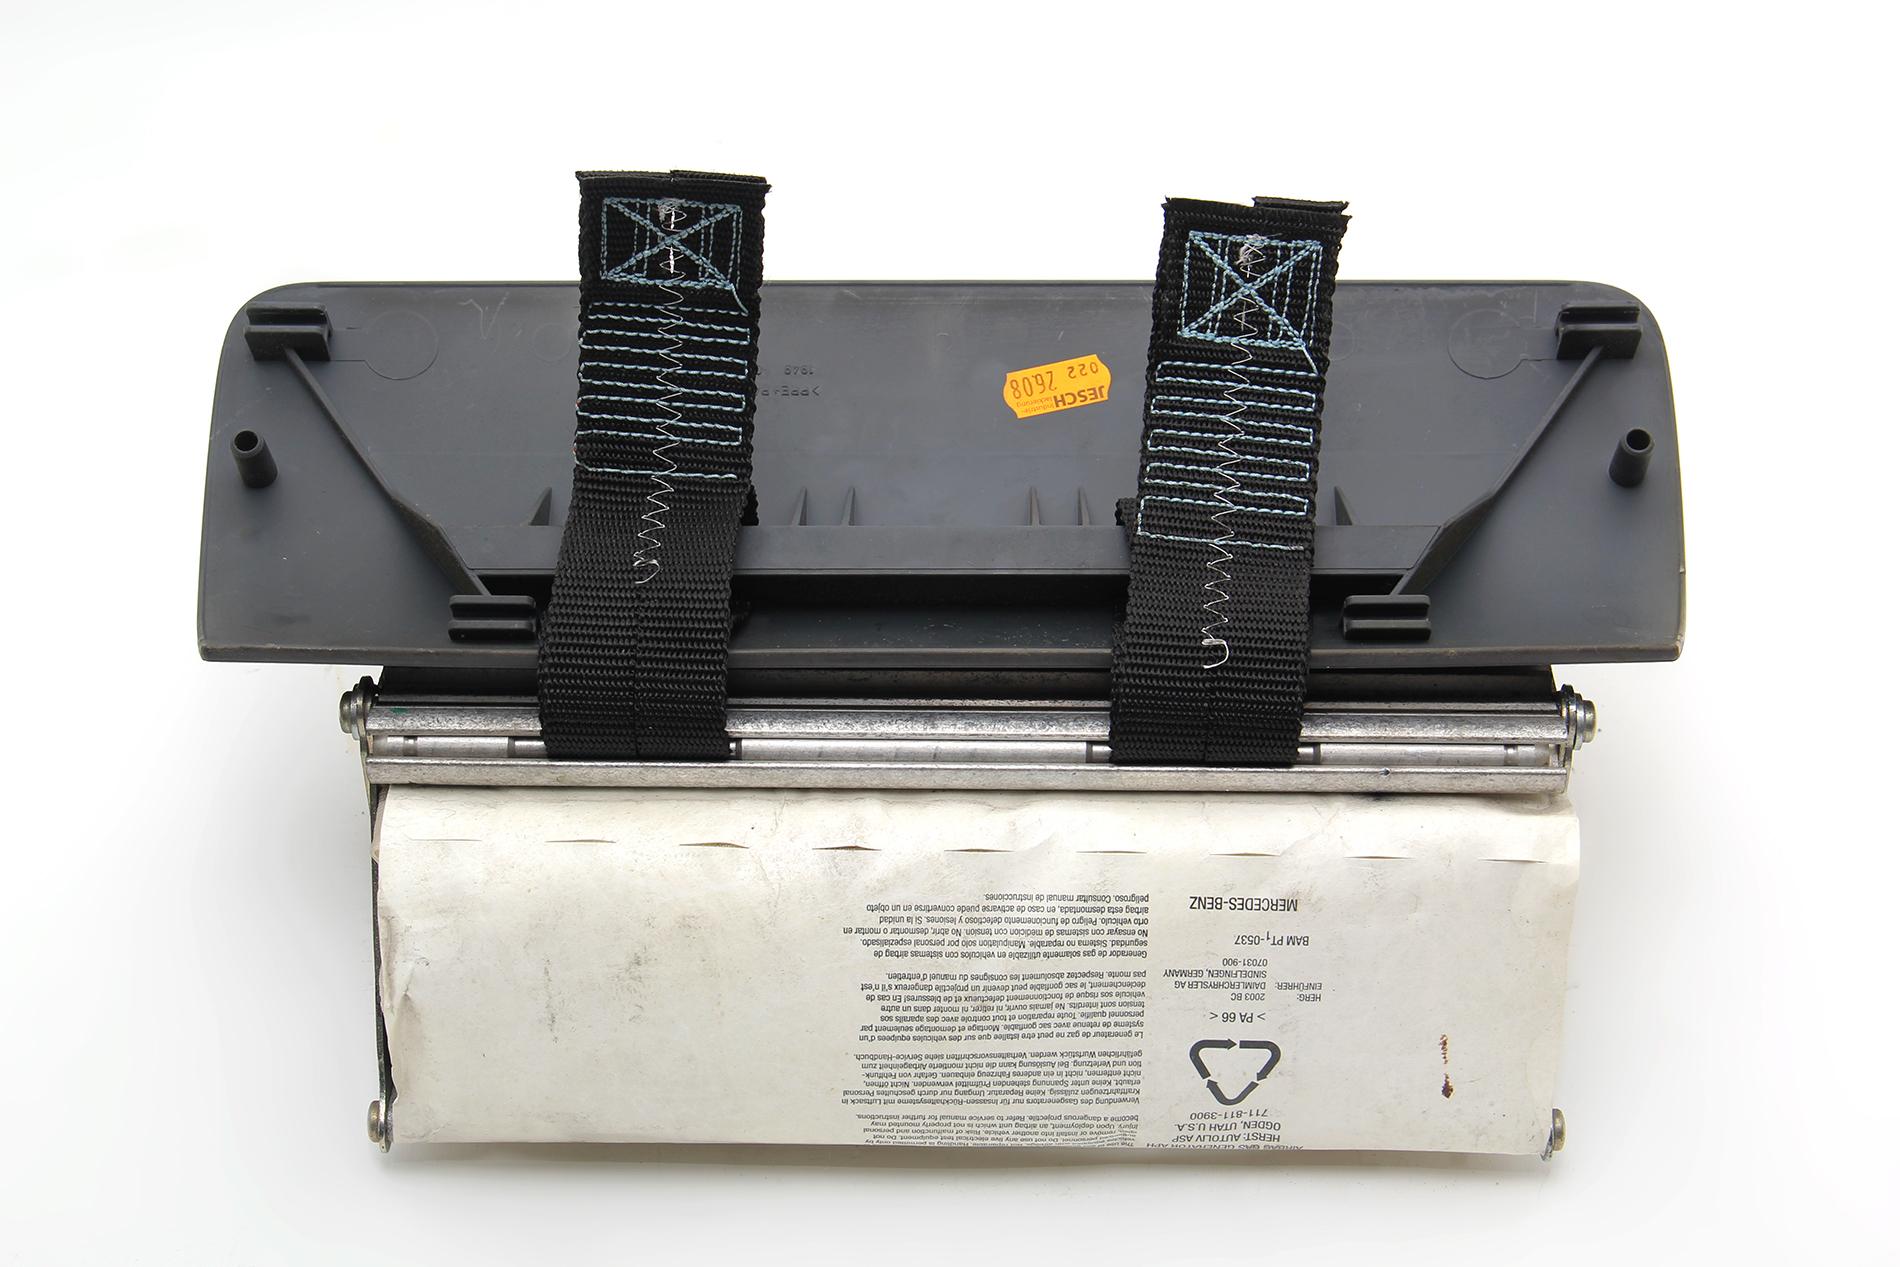 Dodge Sprinter 2500 Dashboard Air Bag Airbag Module 5124934AA OEM 04-06